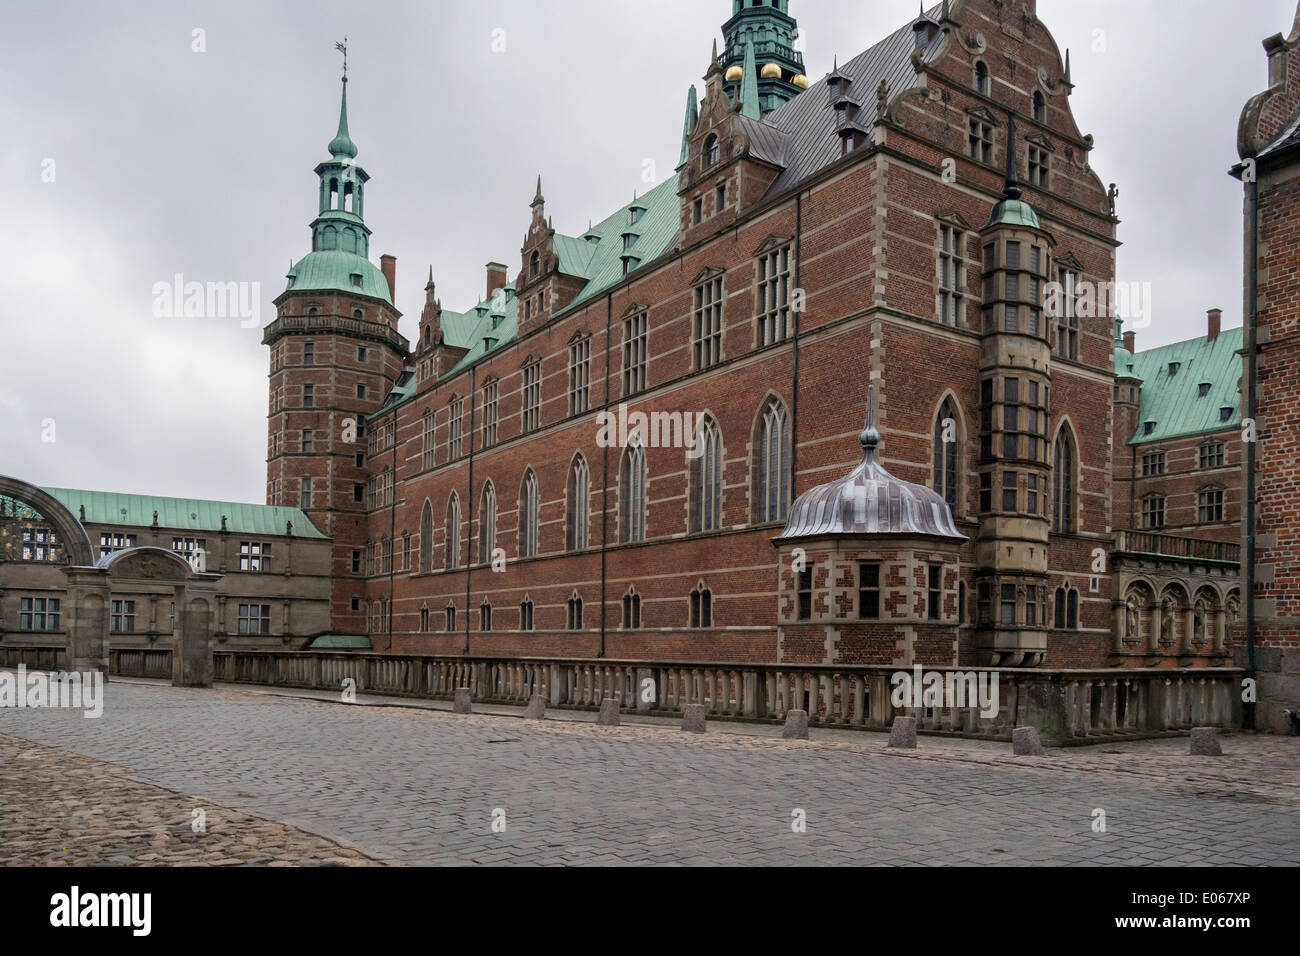 Fredericksborg Palace, Hillerod, Denmakr - Stock Image